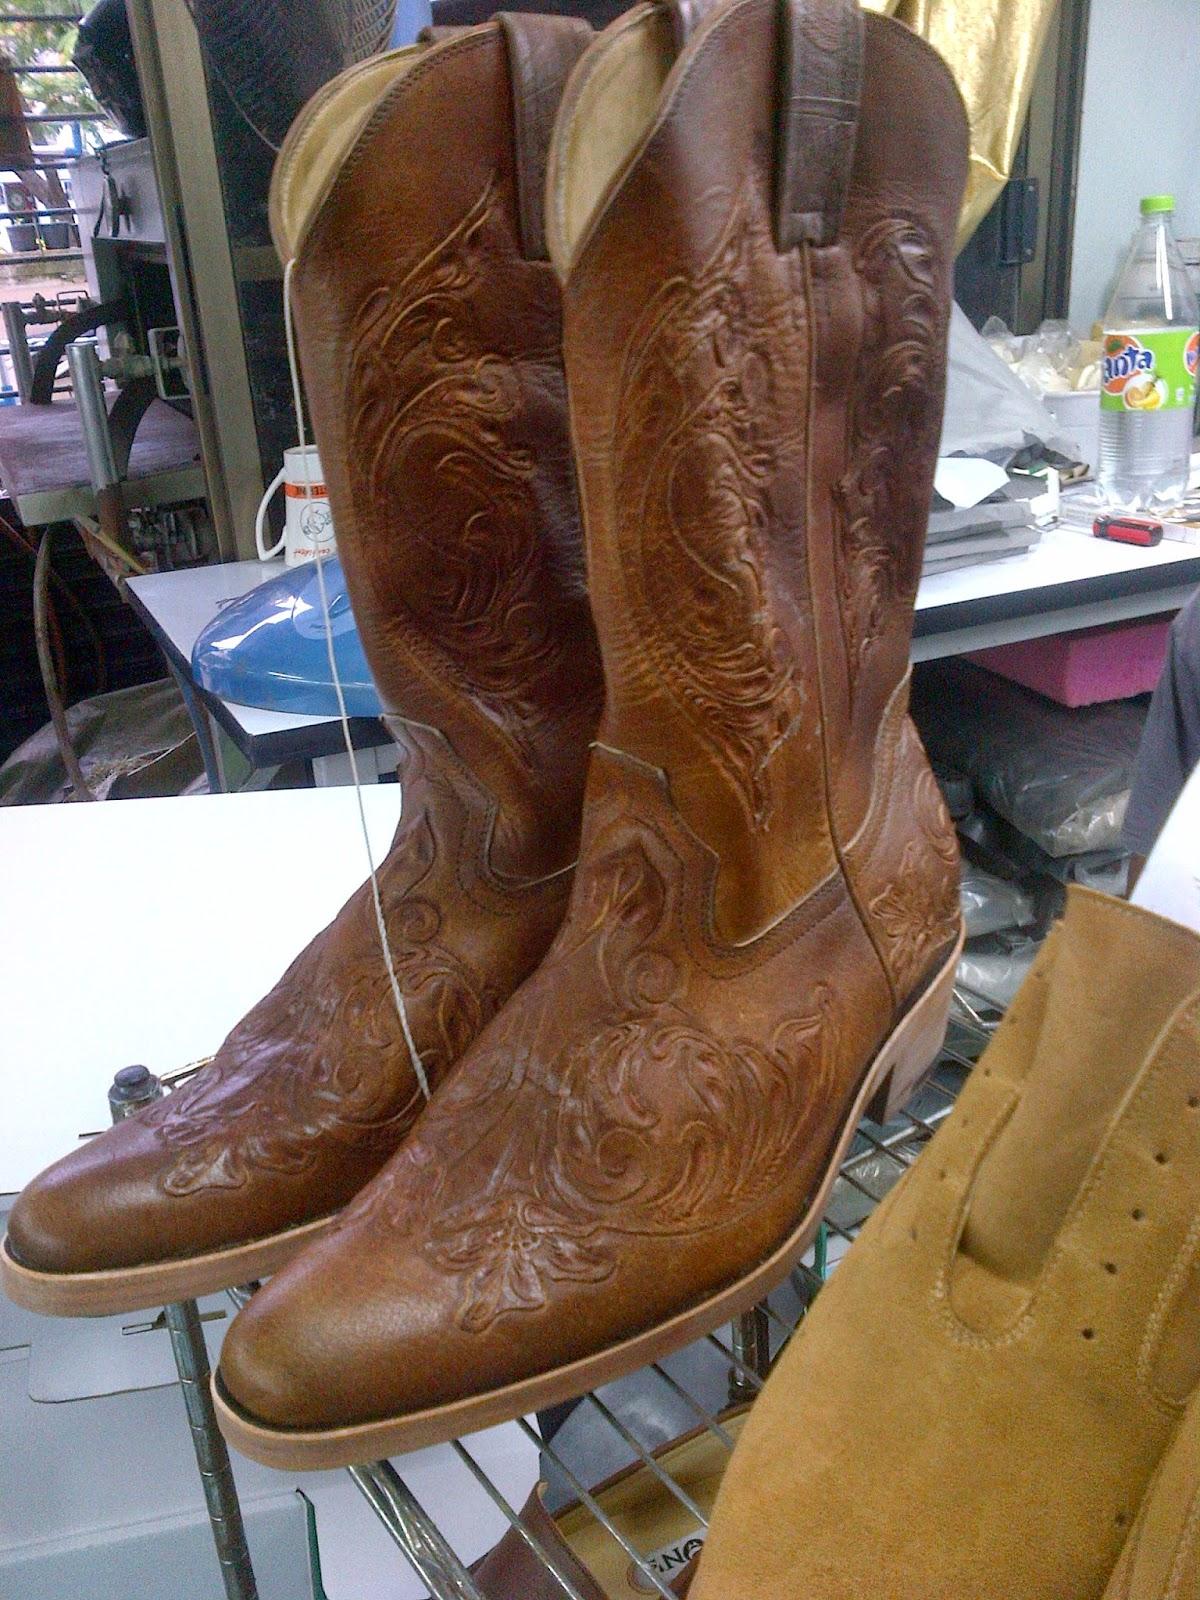 Thai Shoe Factory June 2014